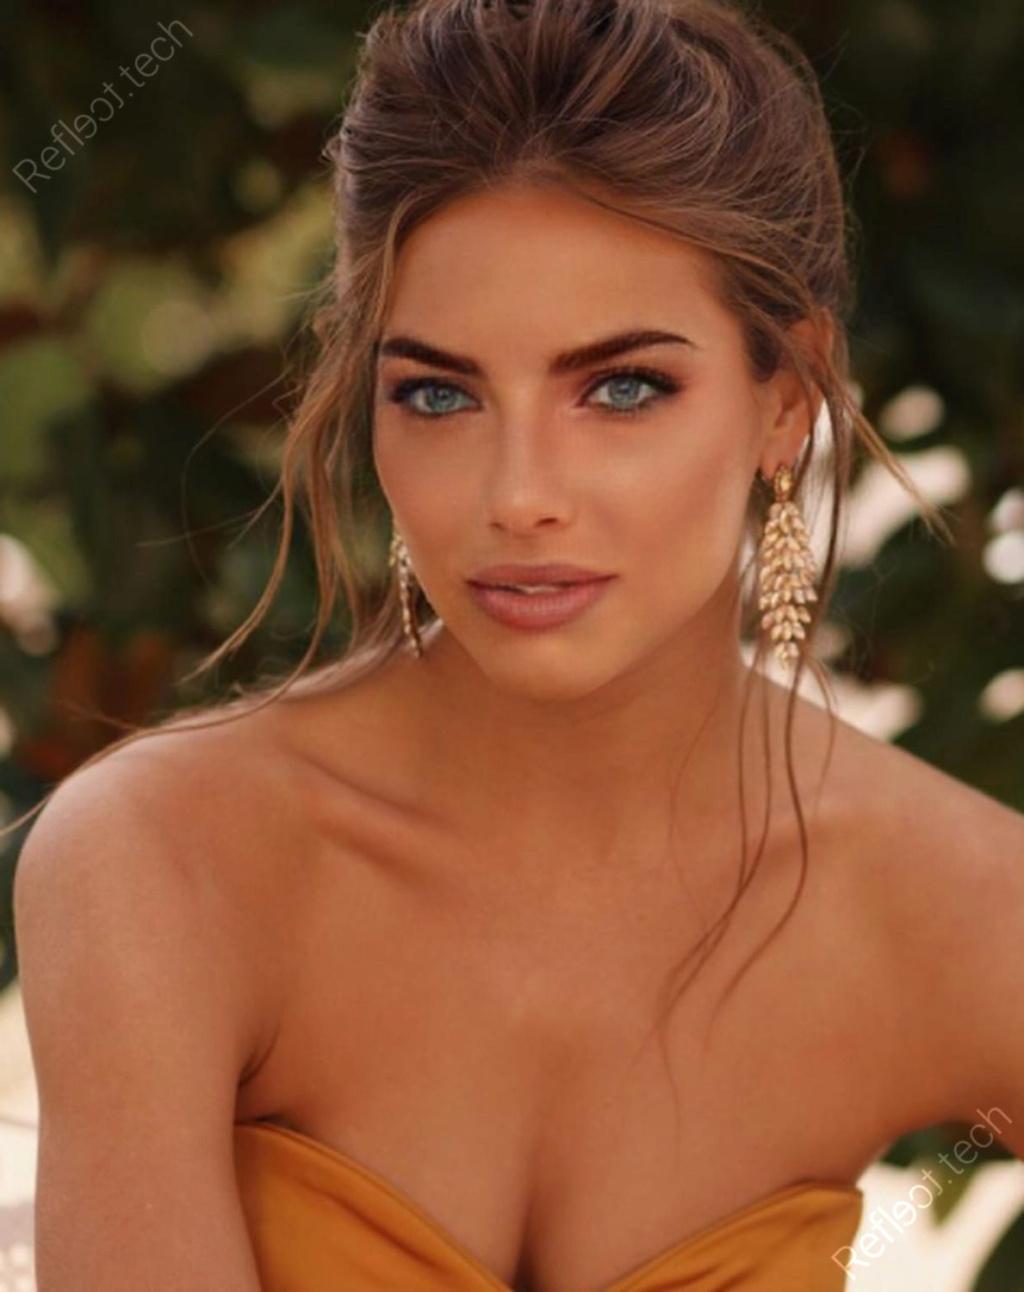 Miss GC 2021-candidatures des miss - Page 2 Reflec13